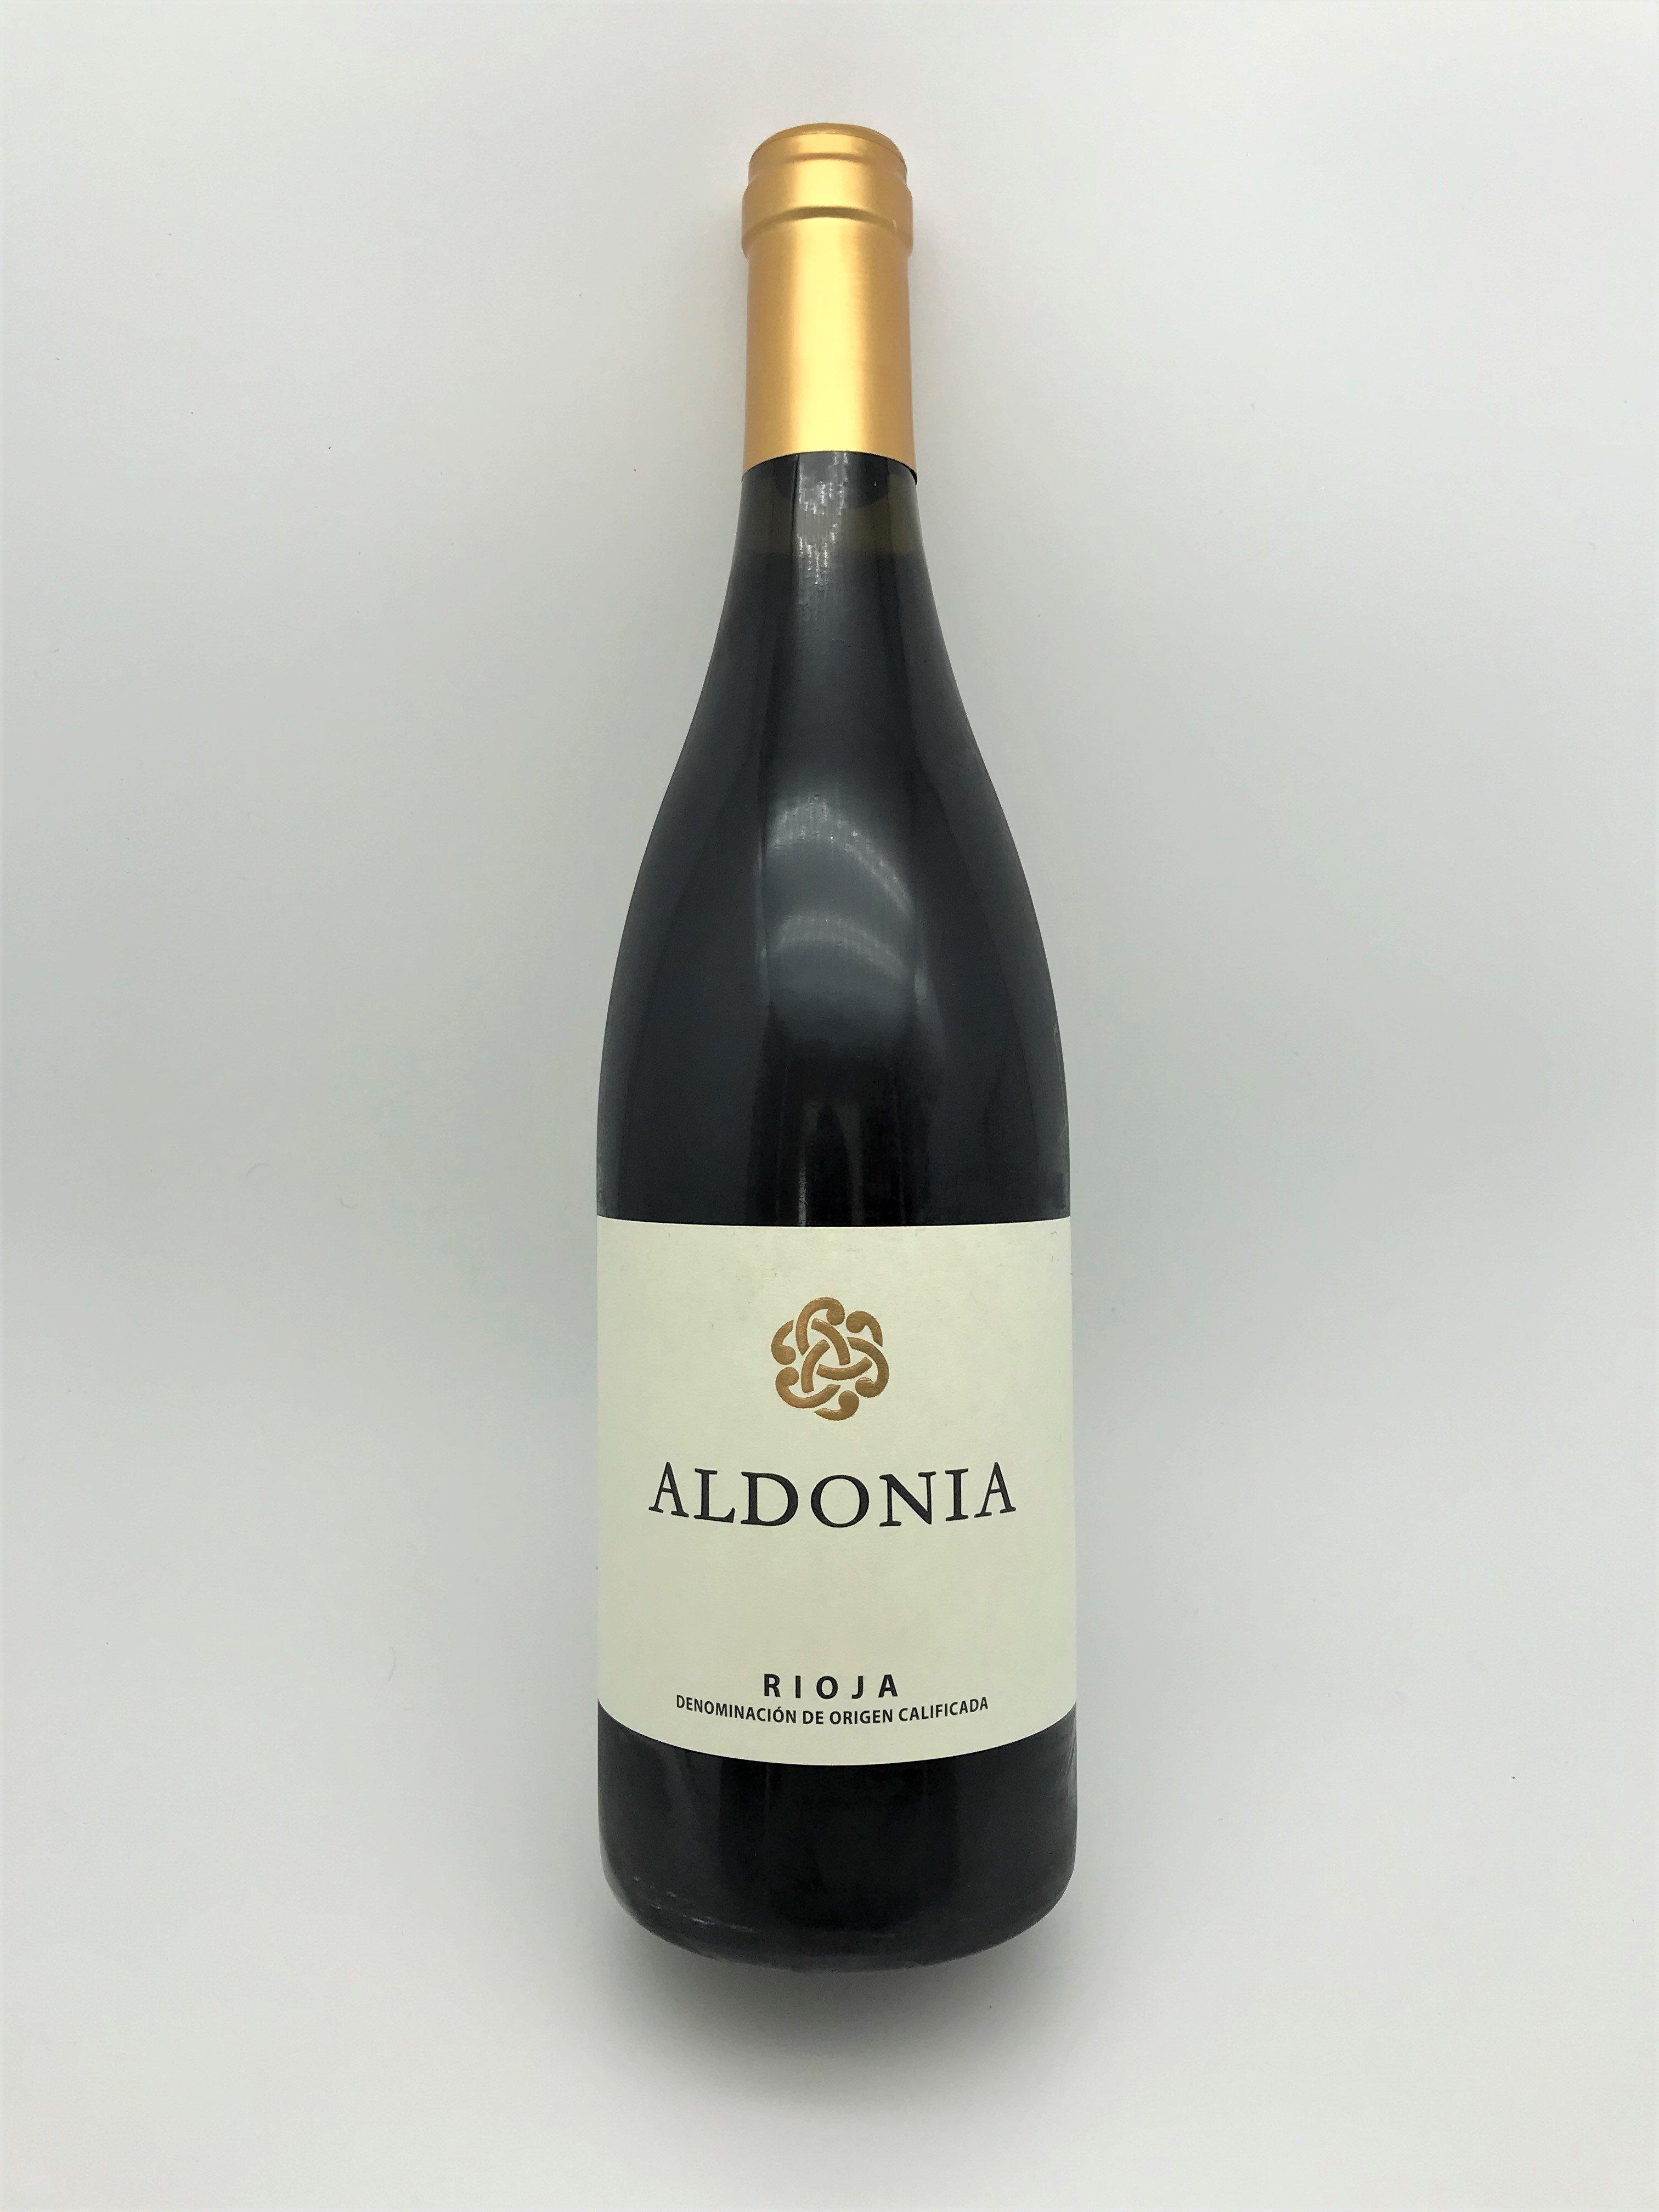 Bodegas Aldonia Rioja, 2016 00102